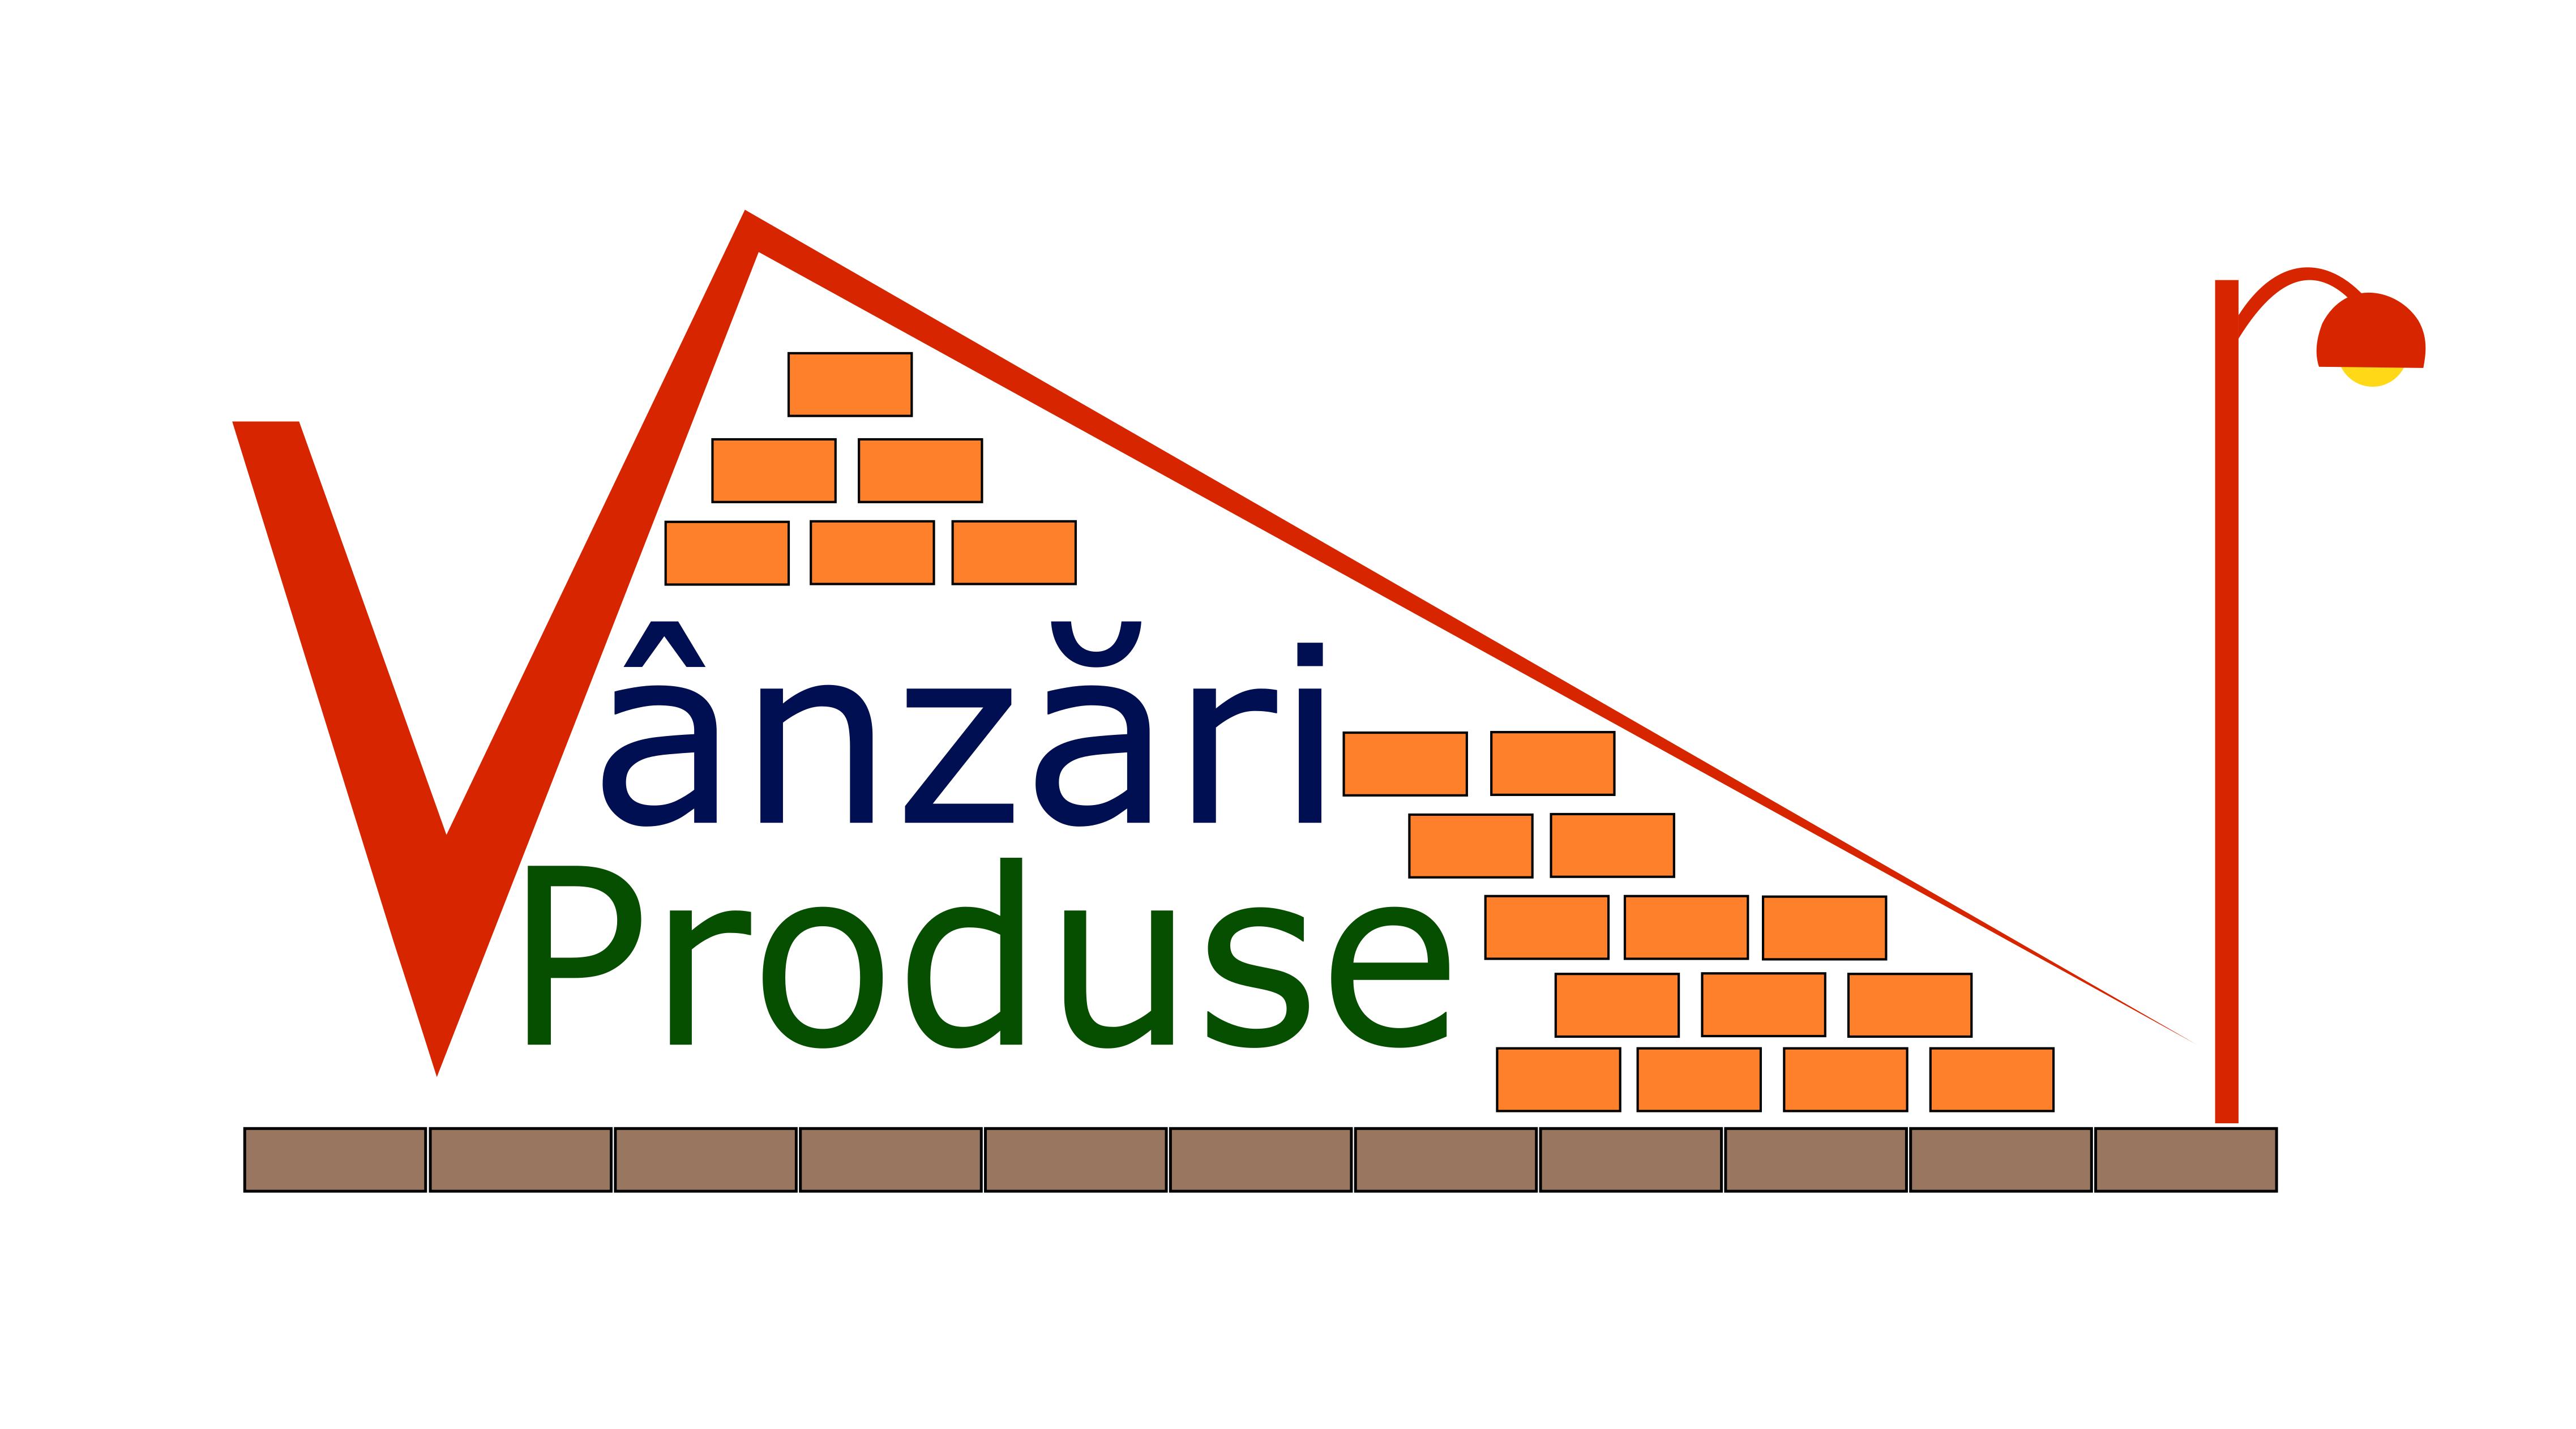 Vanzari Produse